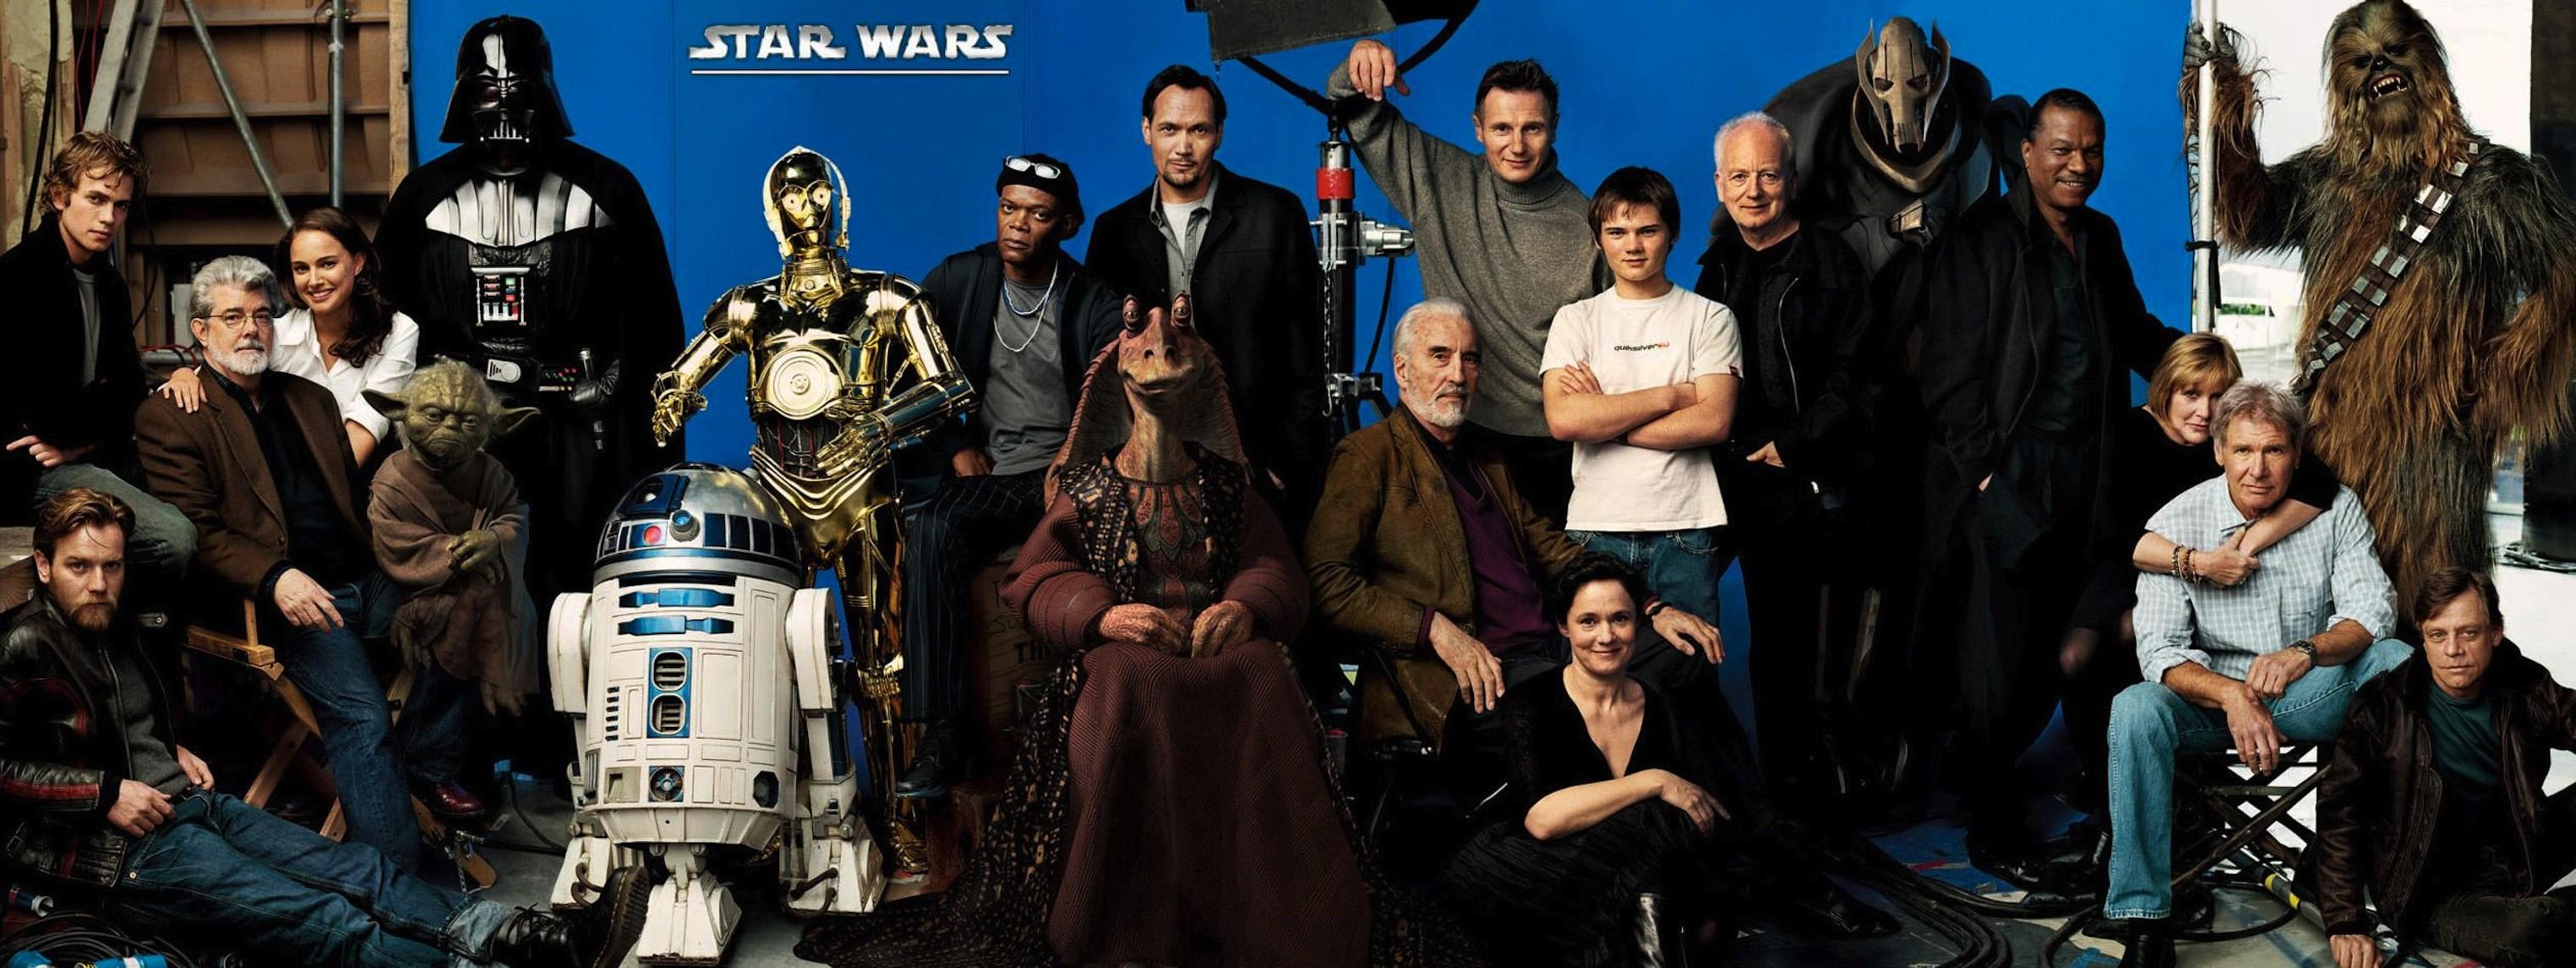 Movie – Star Wars George Lucas C-3PO Jar Jar Binks Harrison Ford R2-